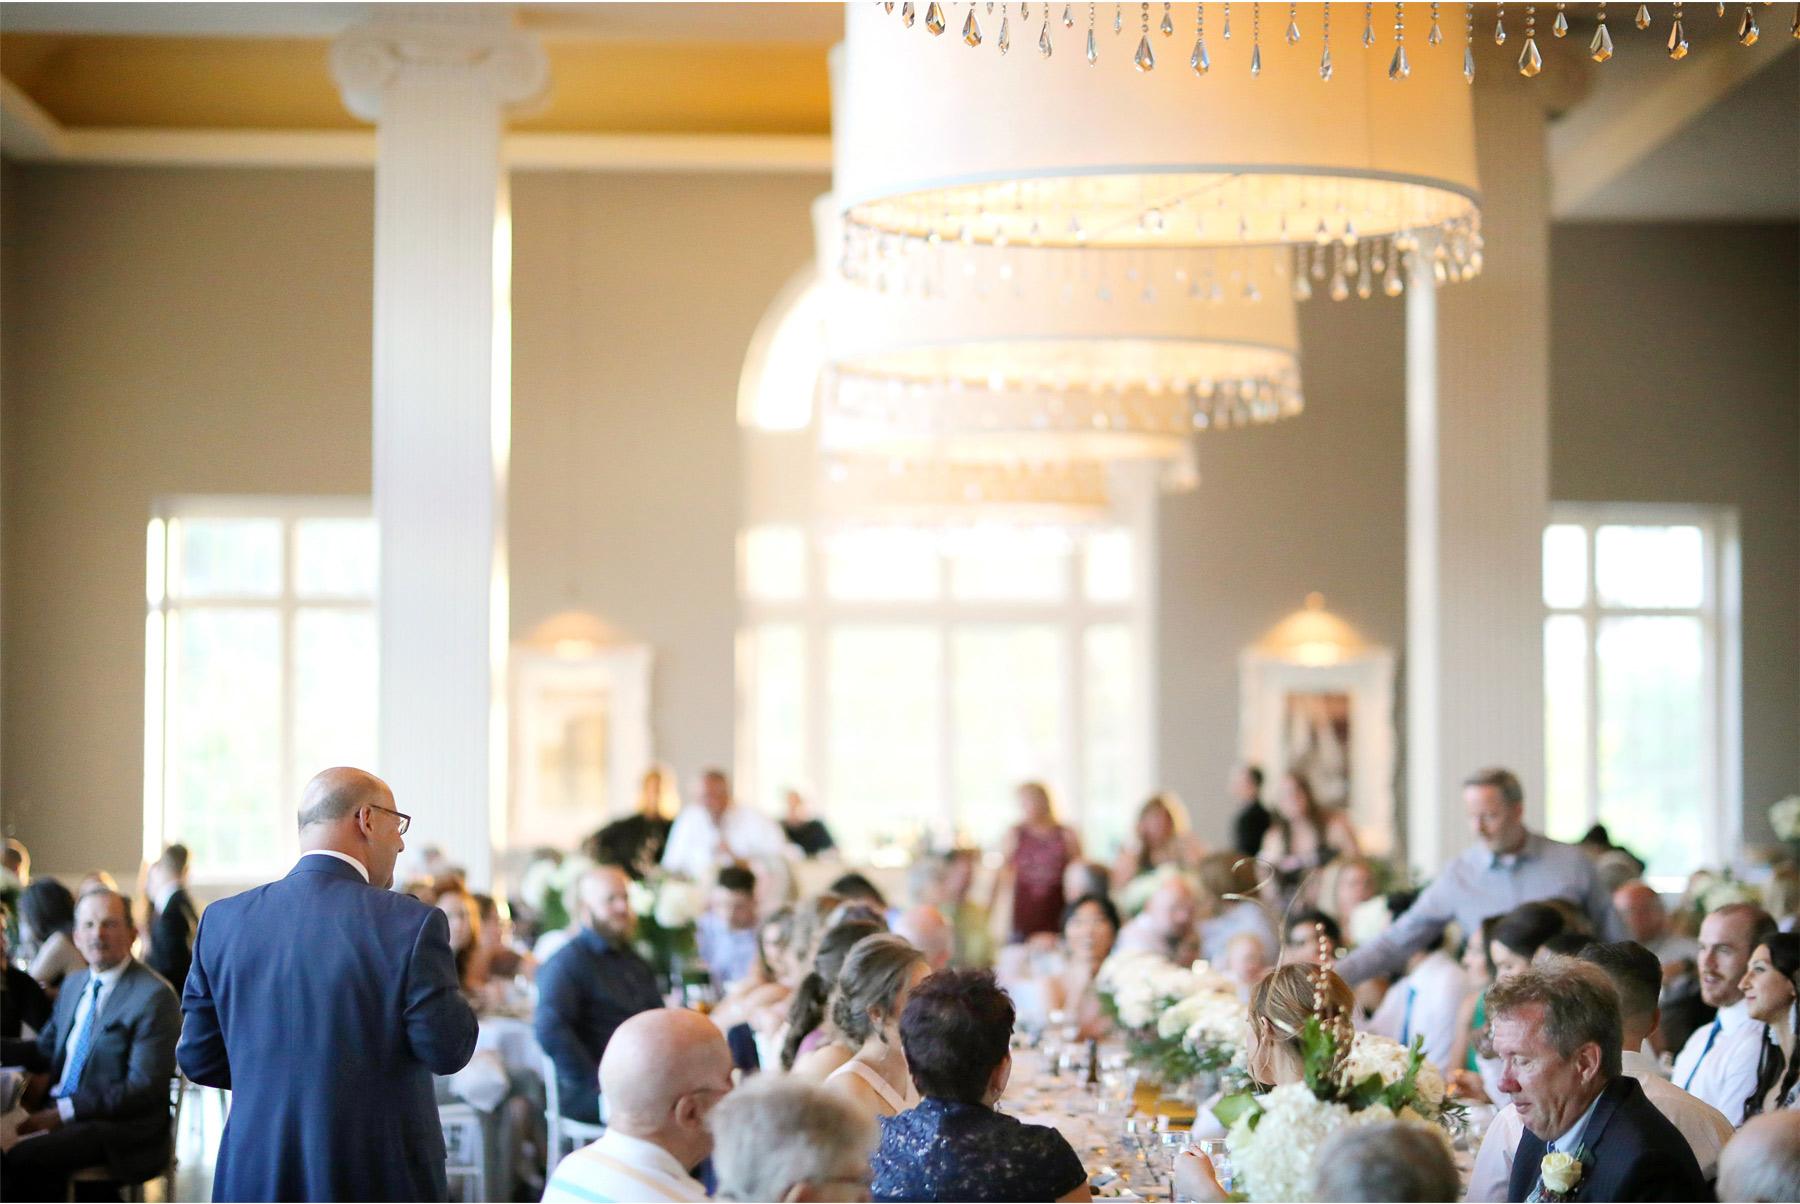 15-Minneapolis-Minnesota-Wedding-Andrew-Vick-Photography-Calhoun-Beach-Club-Reception-Toast-Samantha-and-Ryan.jpg